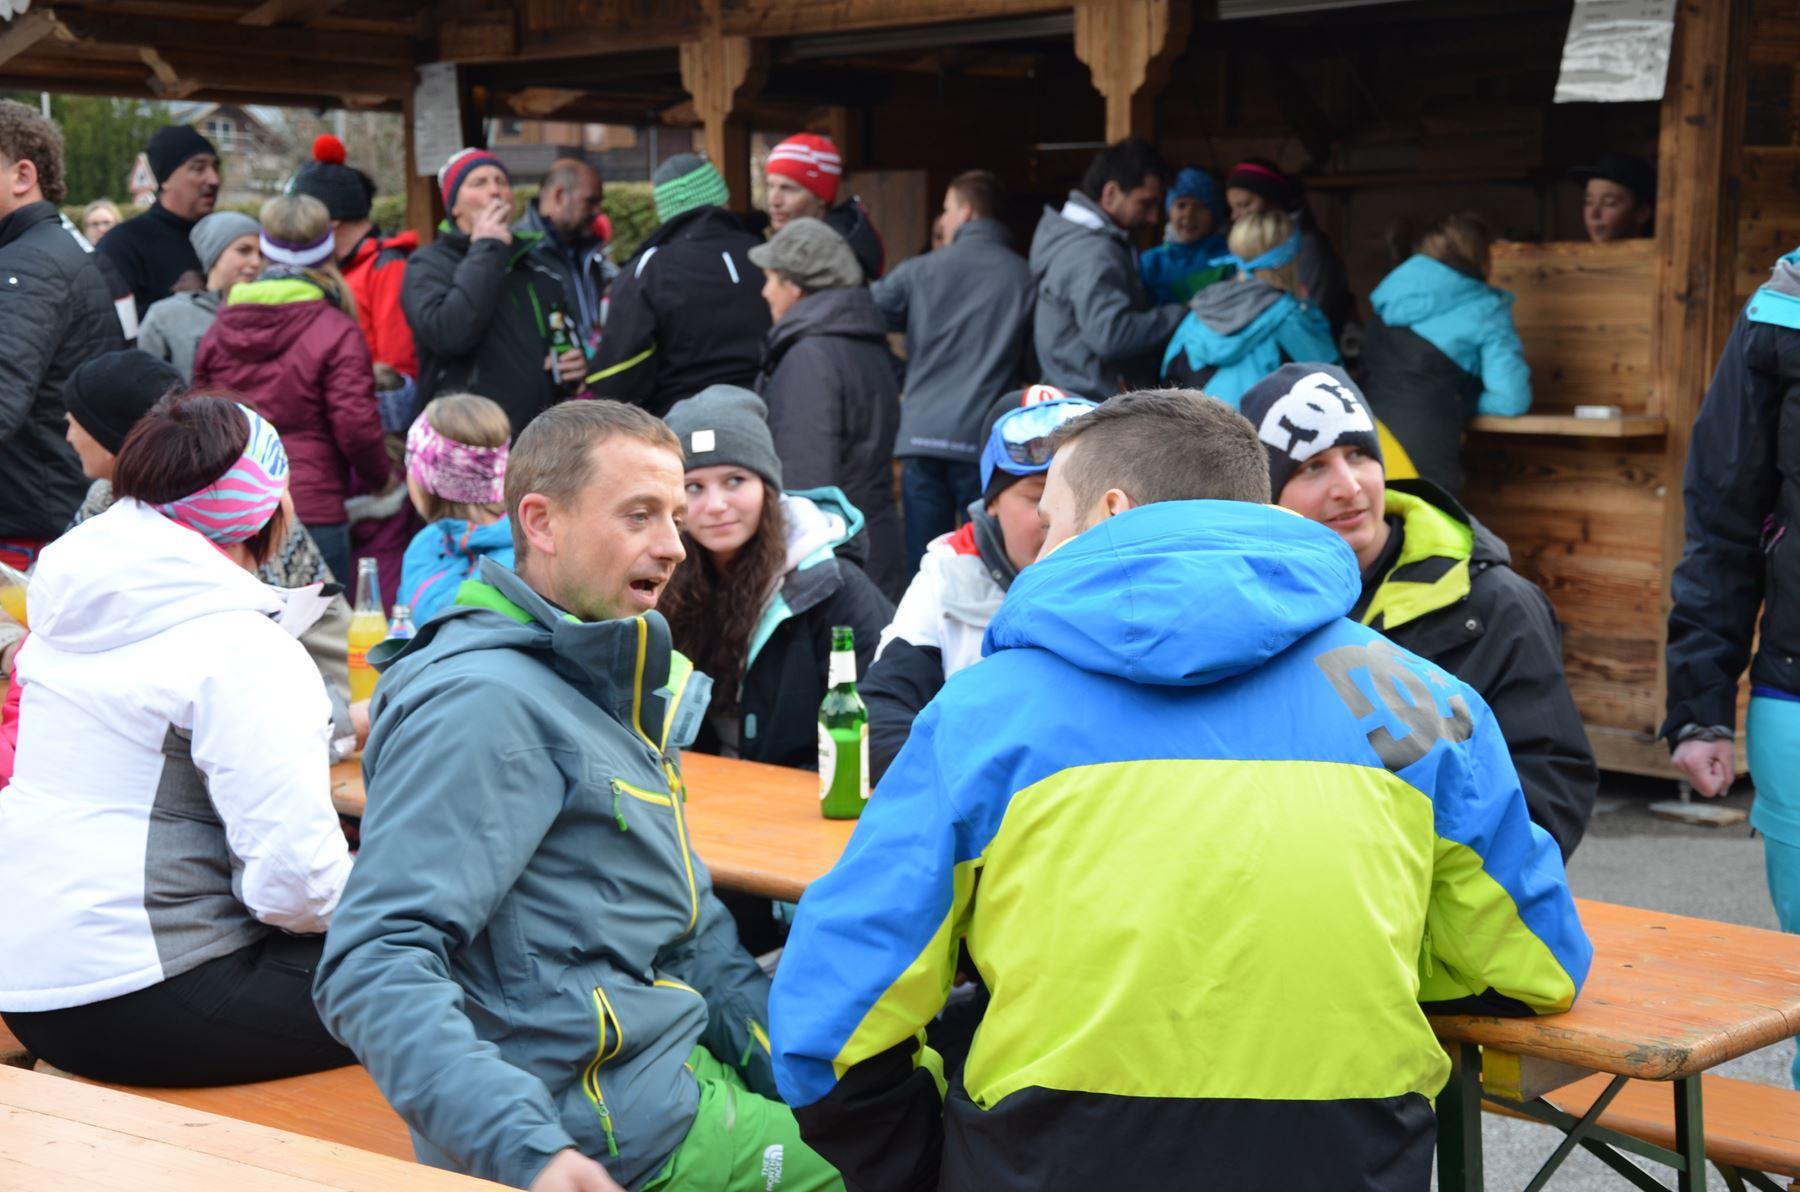 2015-03-22 BV Zillertal Skirennen 350.JPG